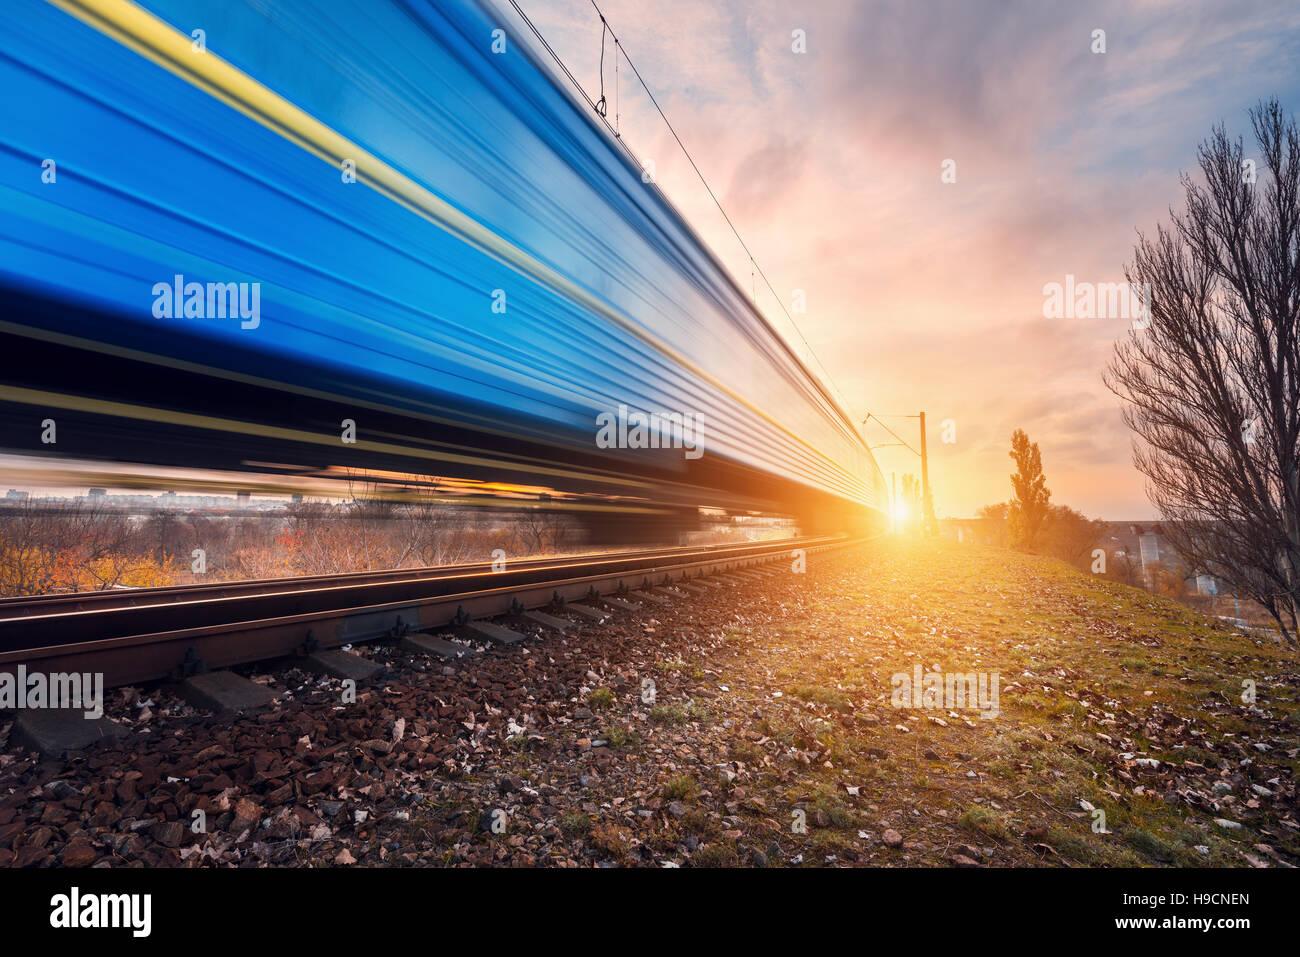 Geschwindigkeit datiert U-Bahn